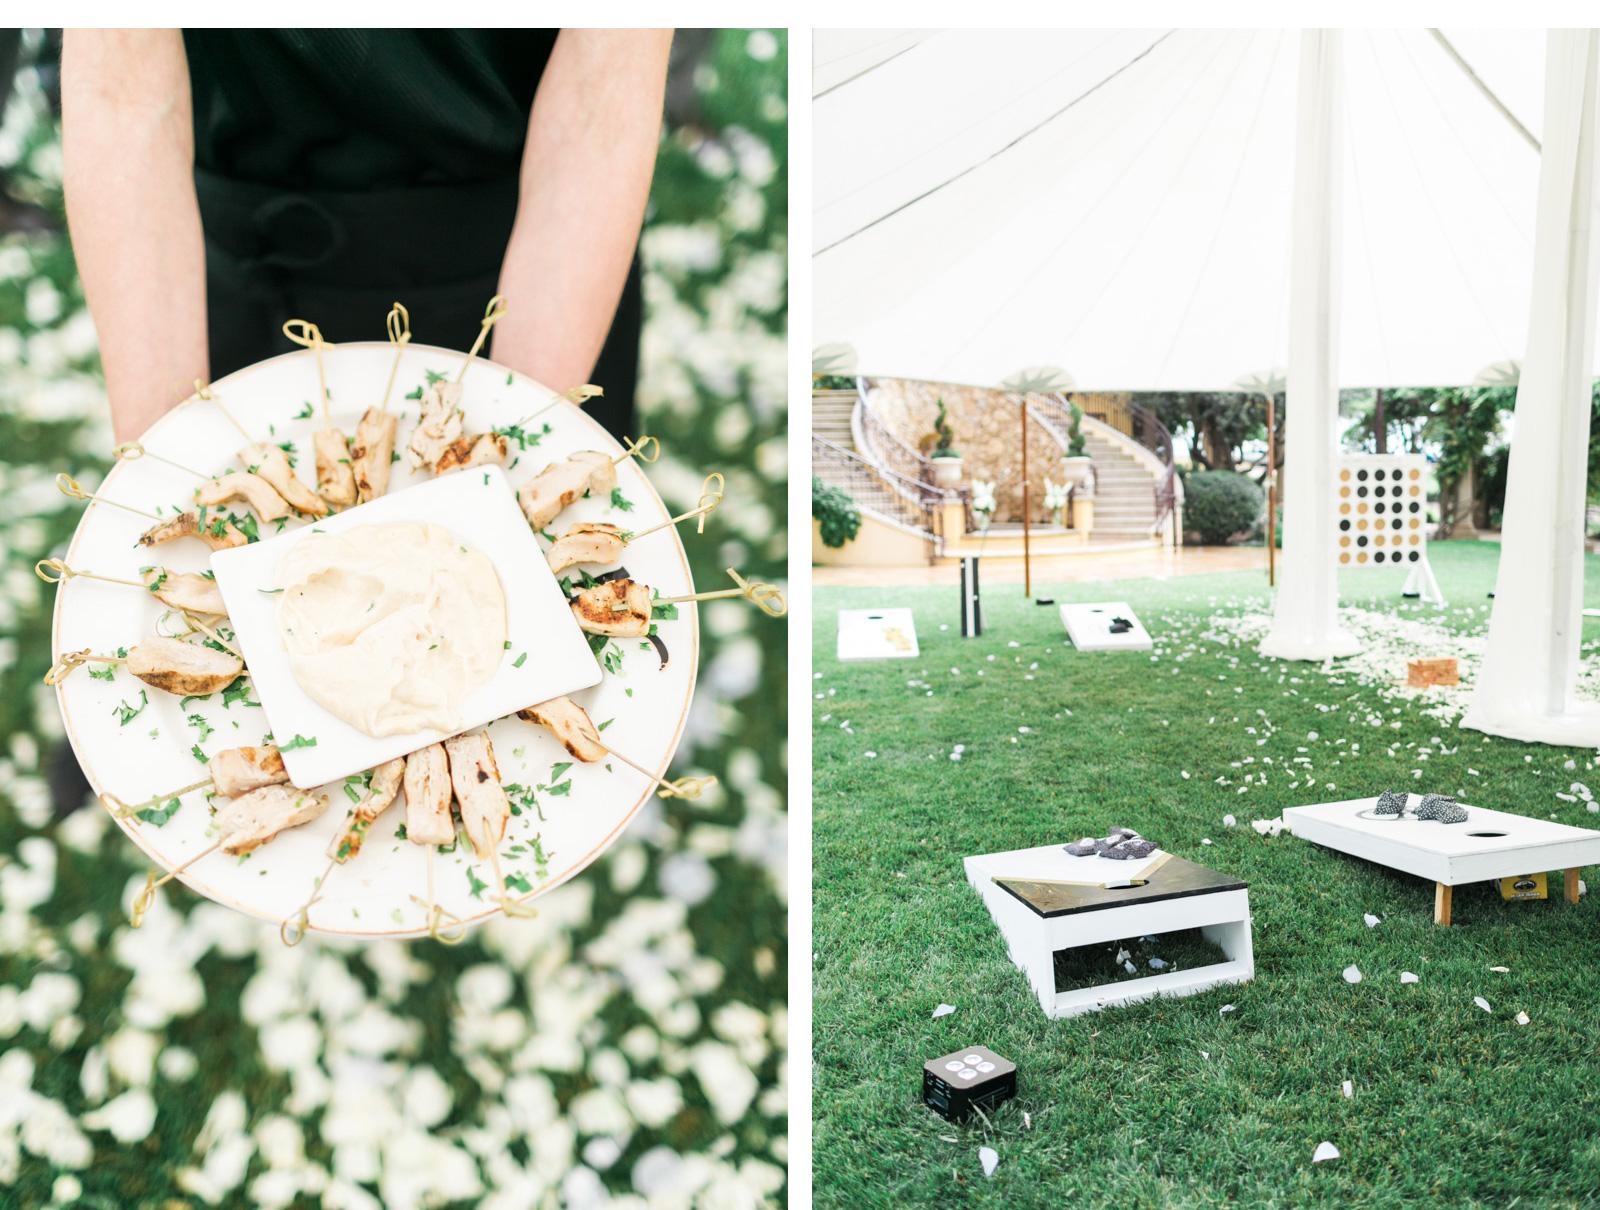 Destination-Adventure-Wedding-Photographer-Natalie-Schutt-Photography_04.jpg